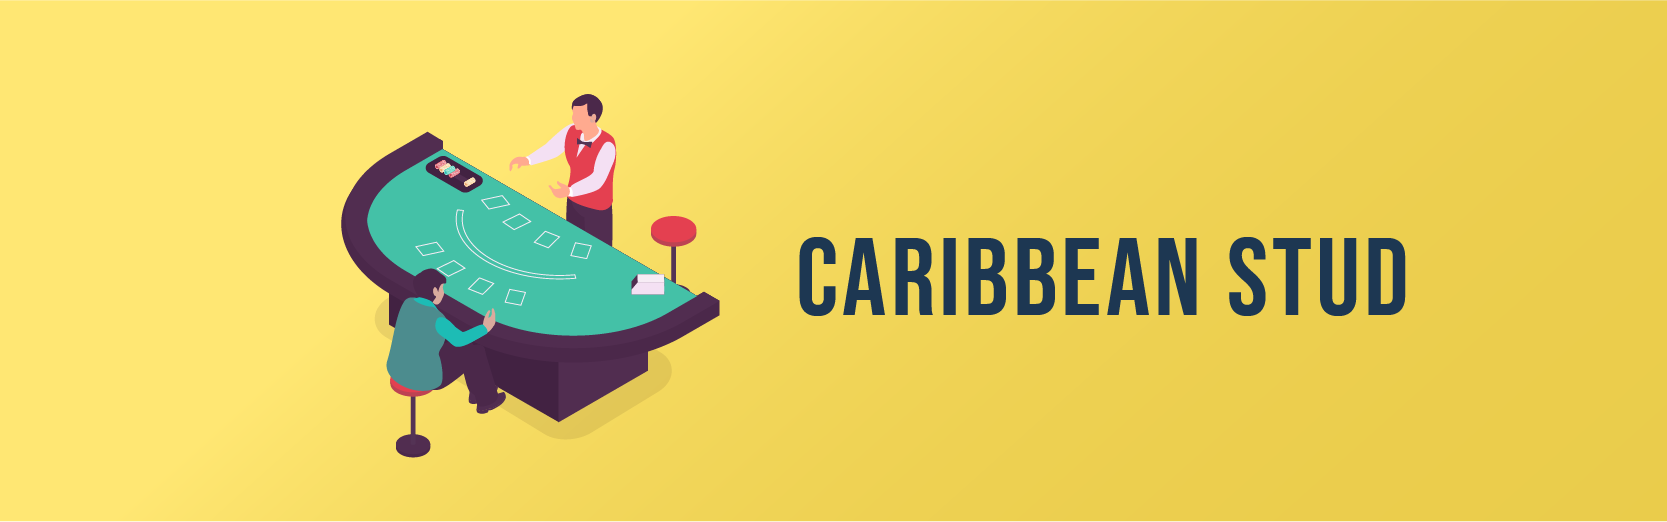 caribbean stud banner